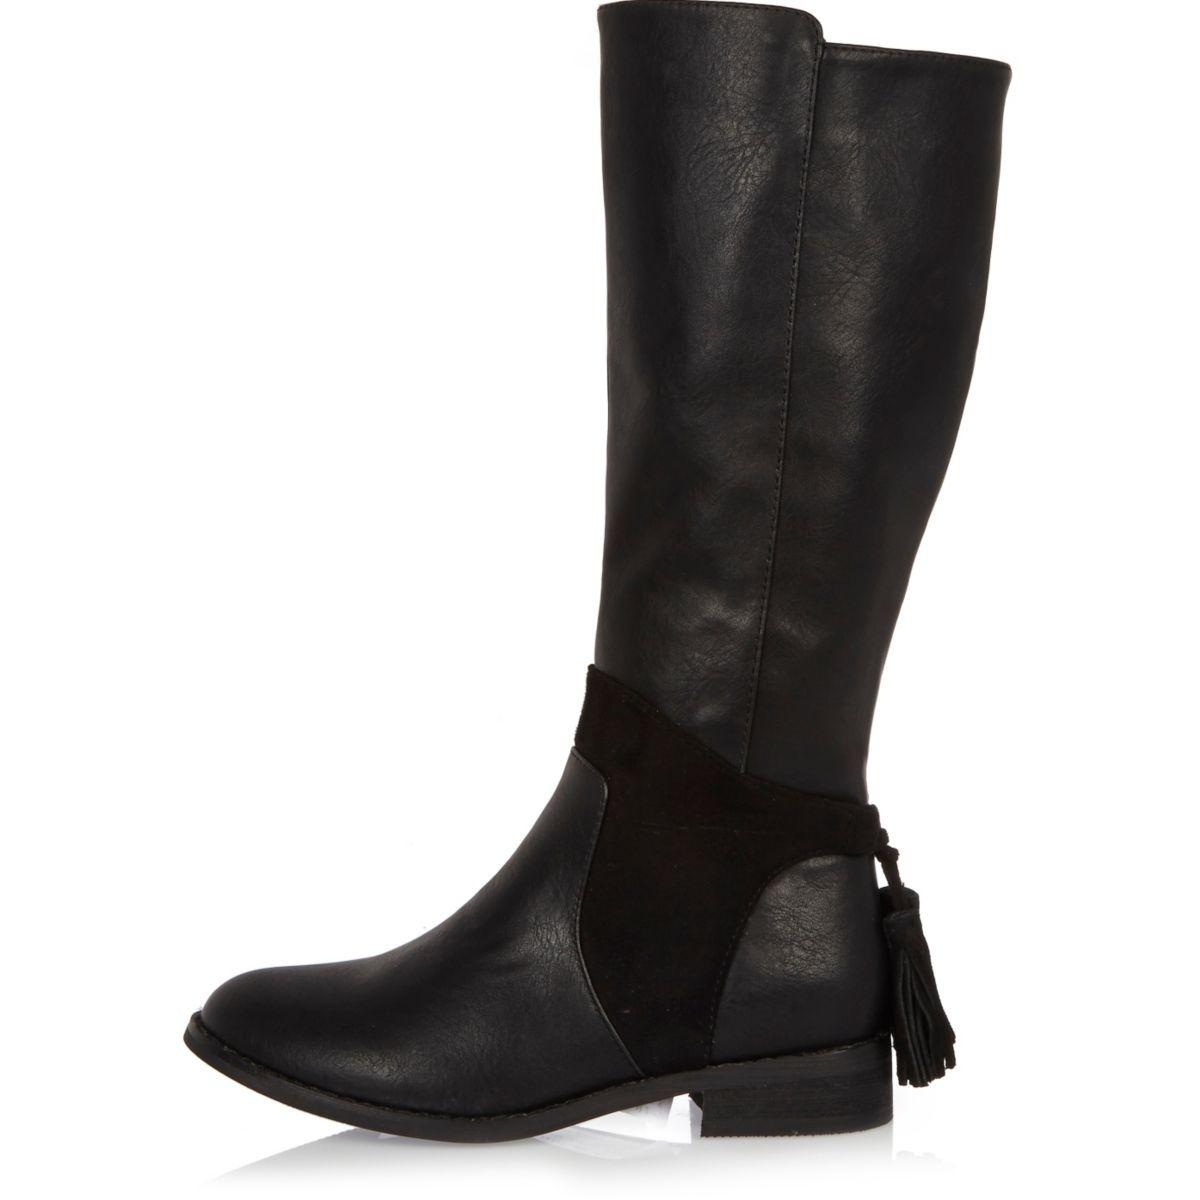 Girls black knee high rider boots